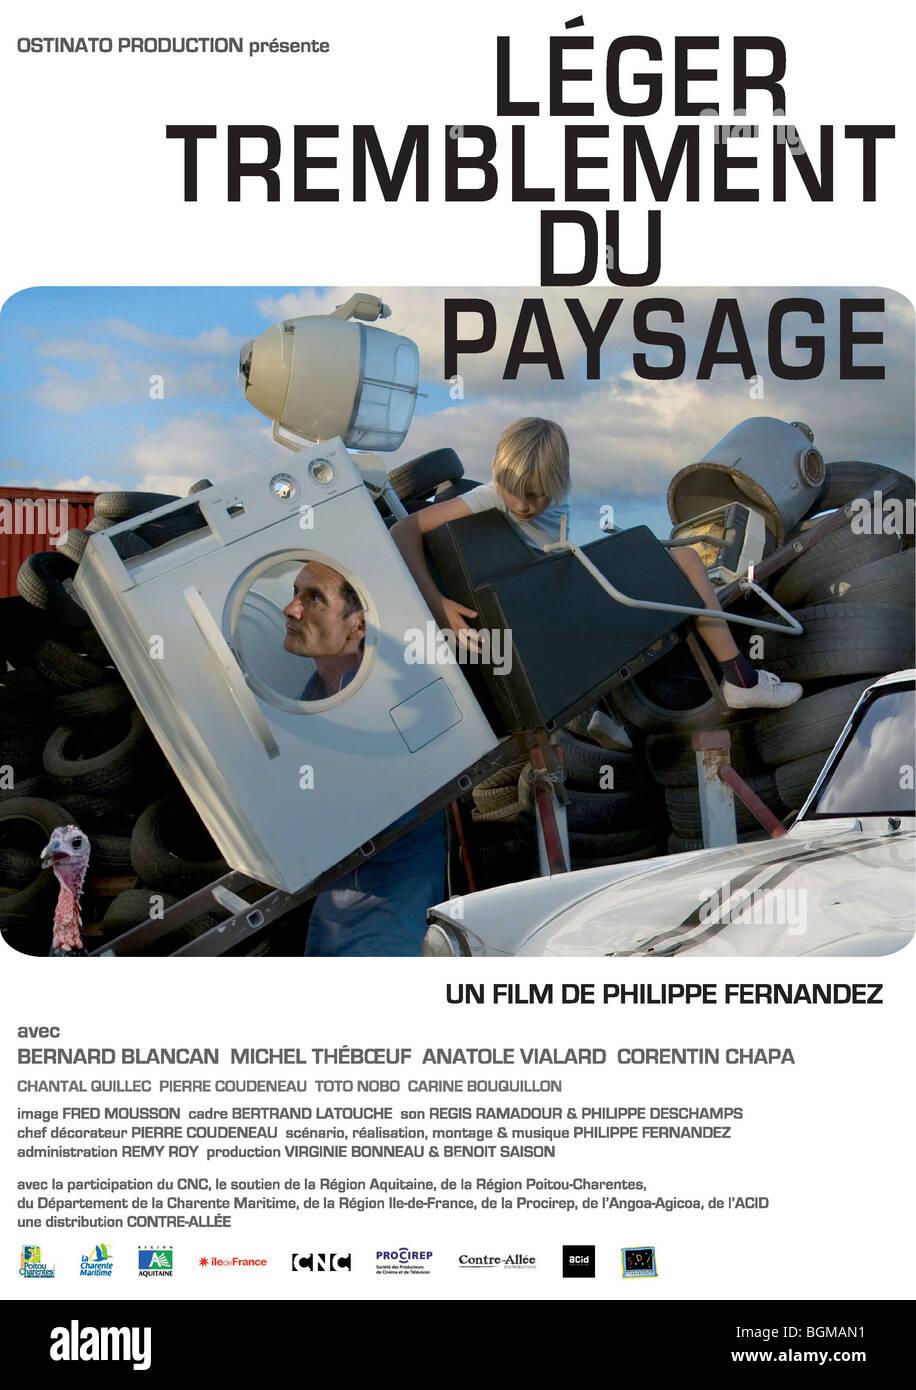 Leger tremblement du paysage Year : 2009 Director : Philippe Fernandez Movie poster (Fr) - Stock Image